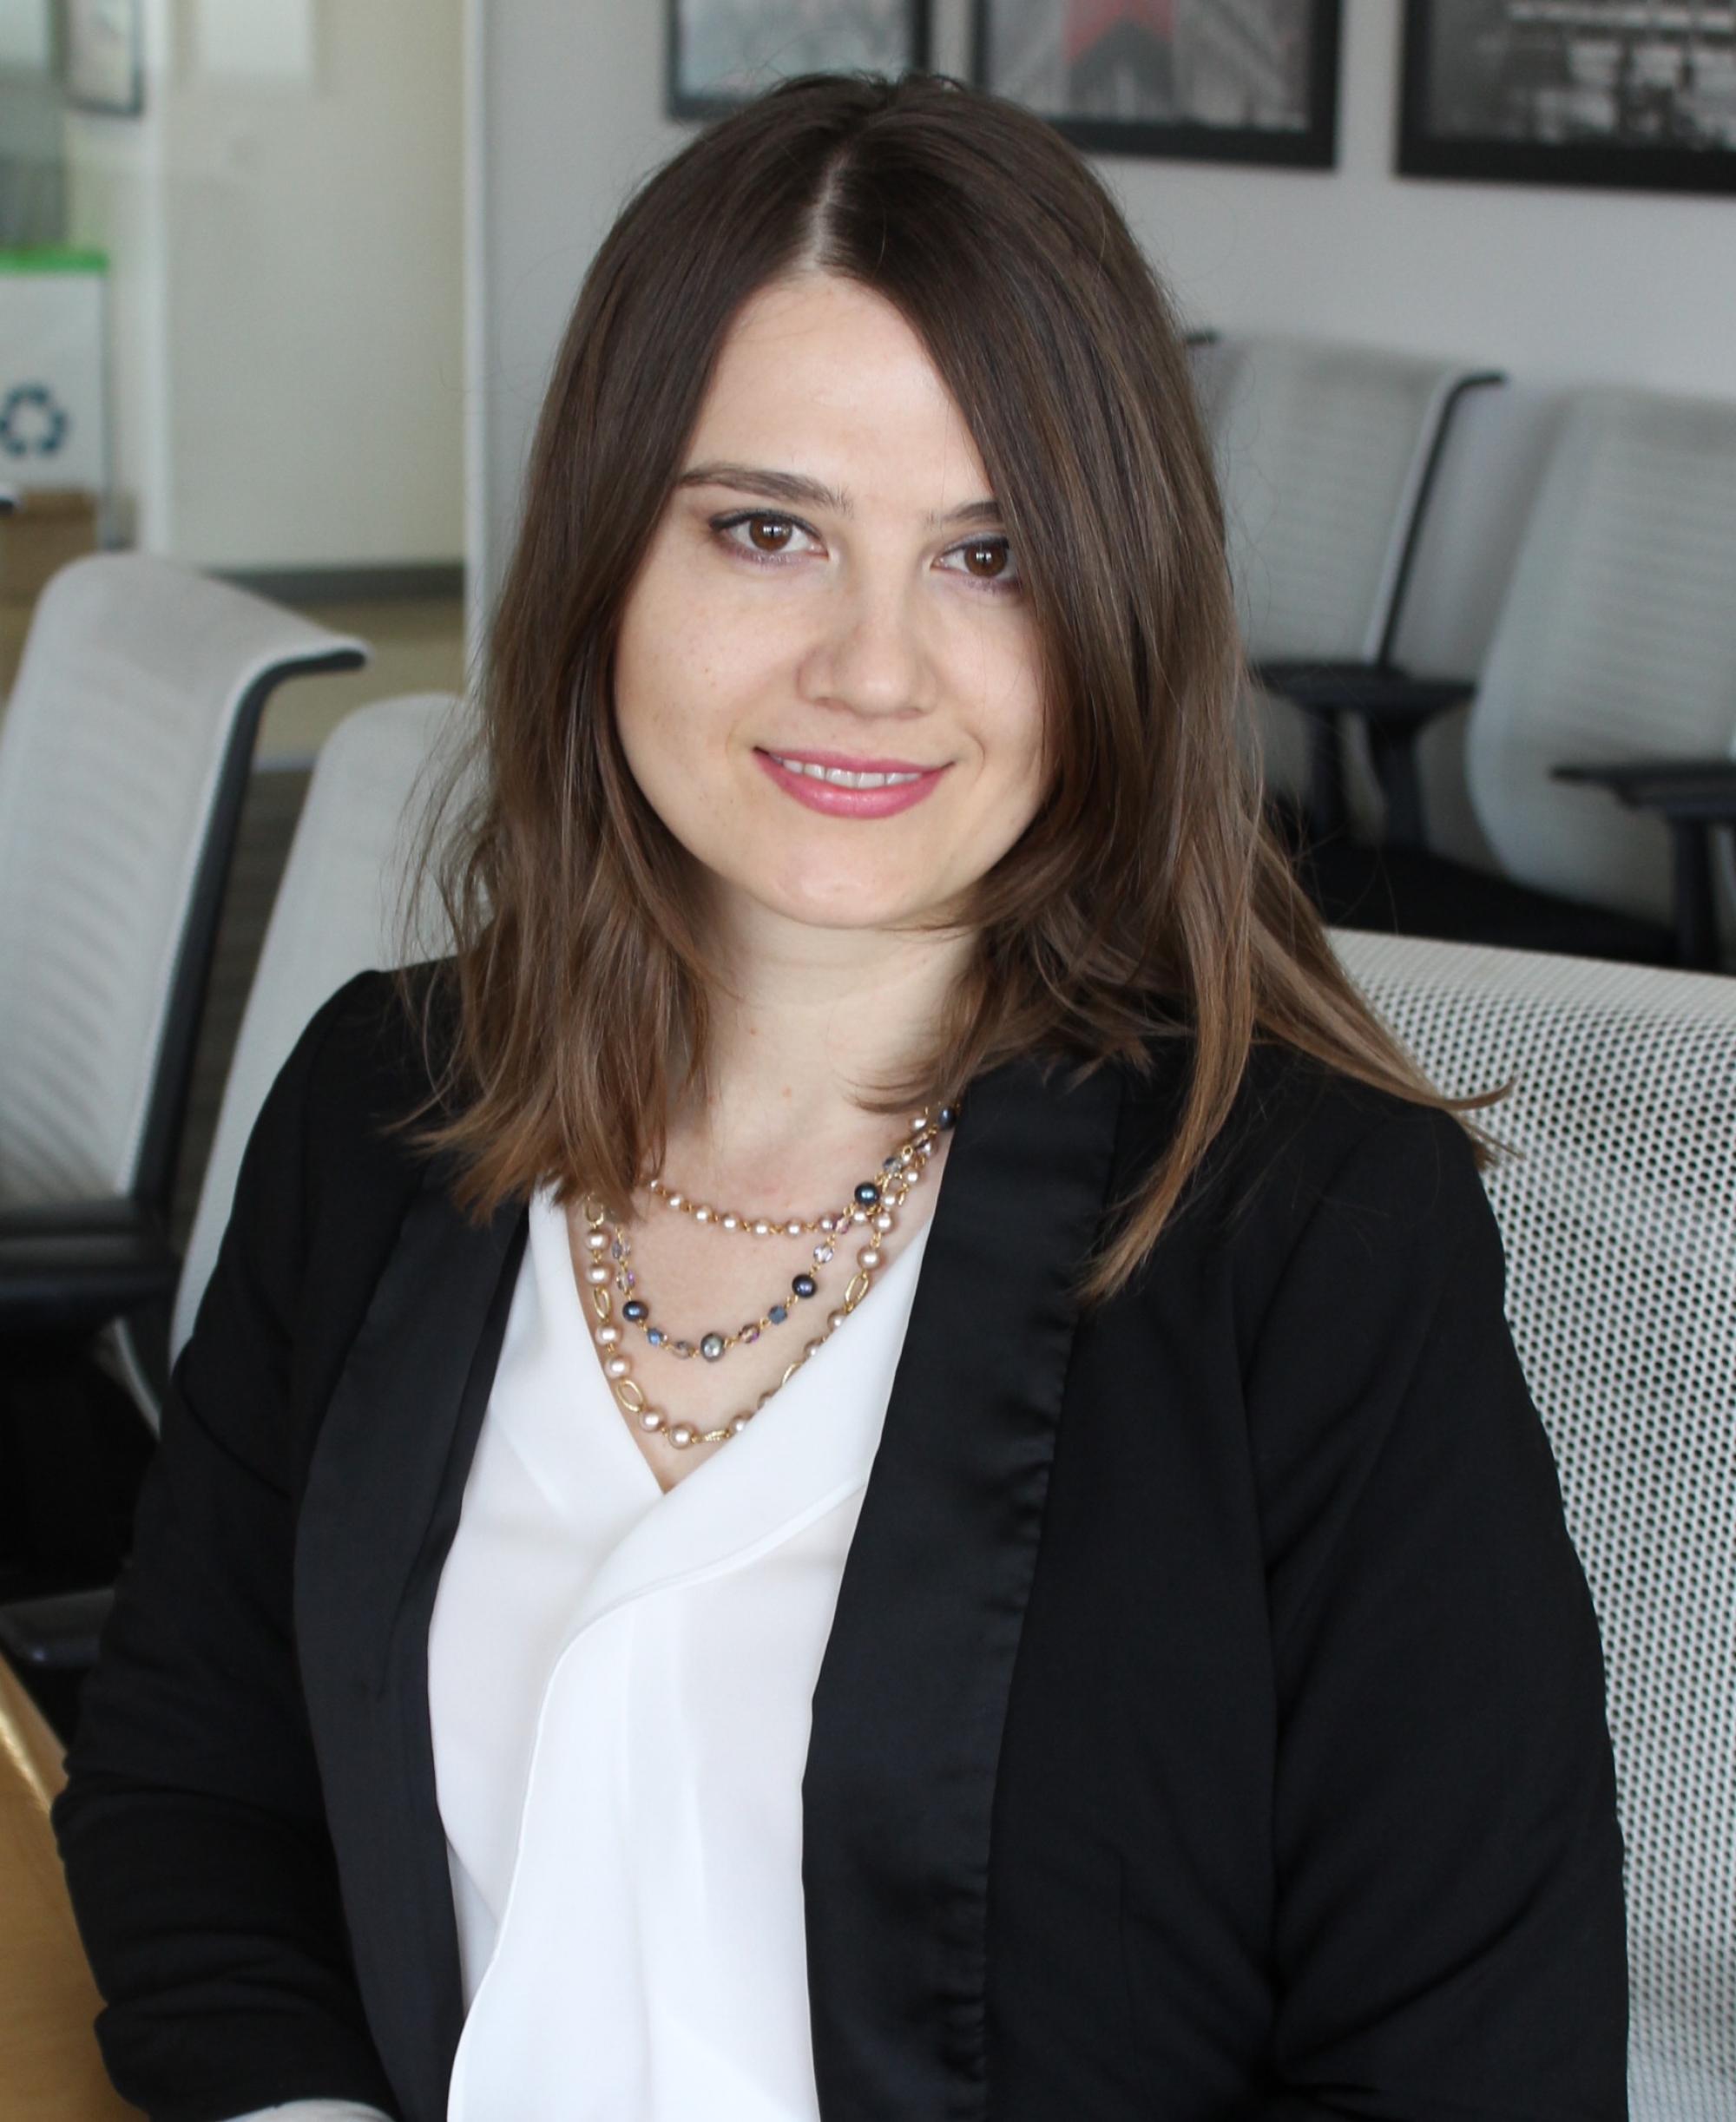 Olena Kopystynska